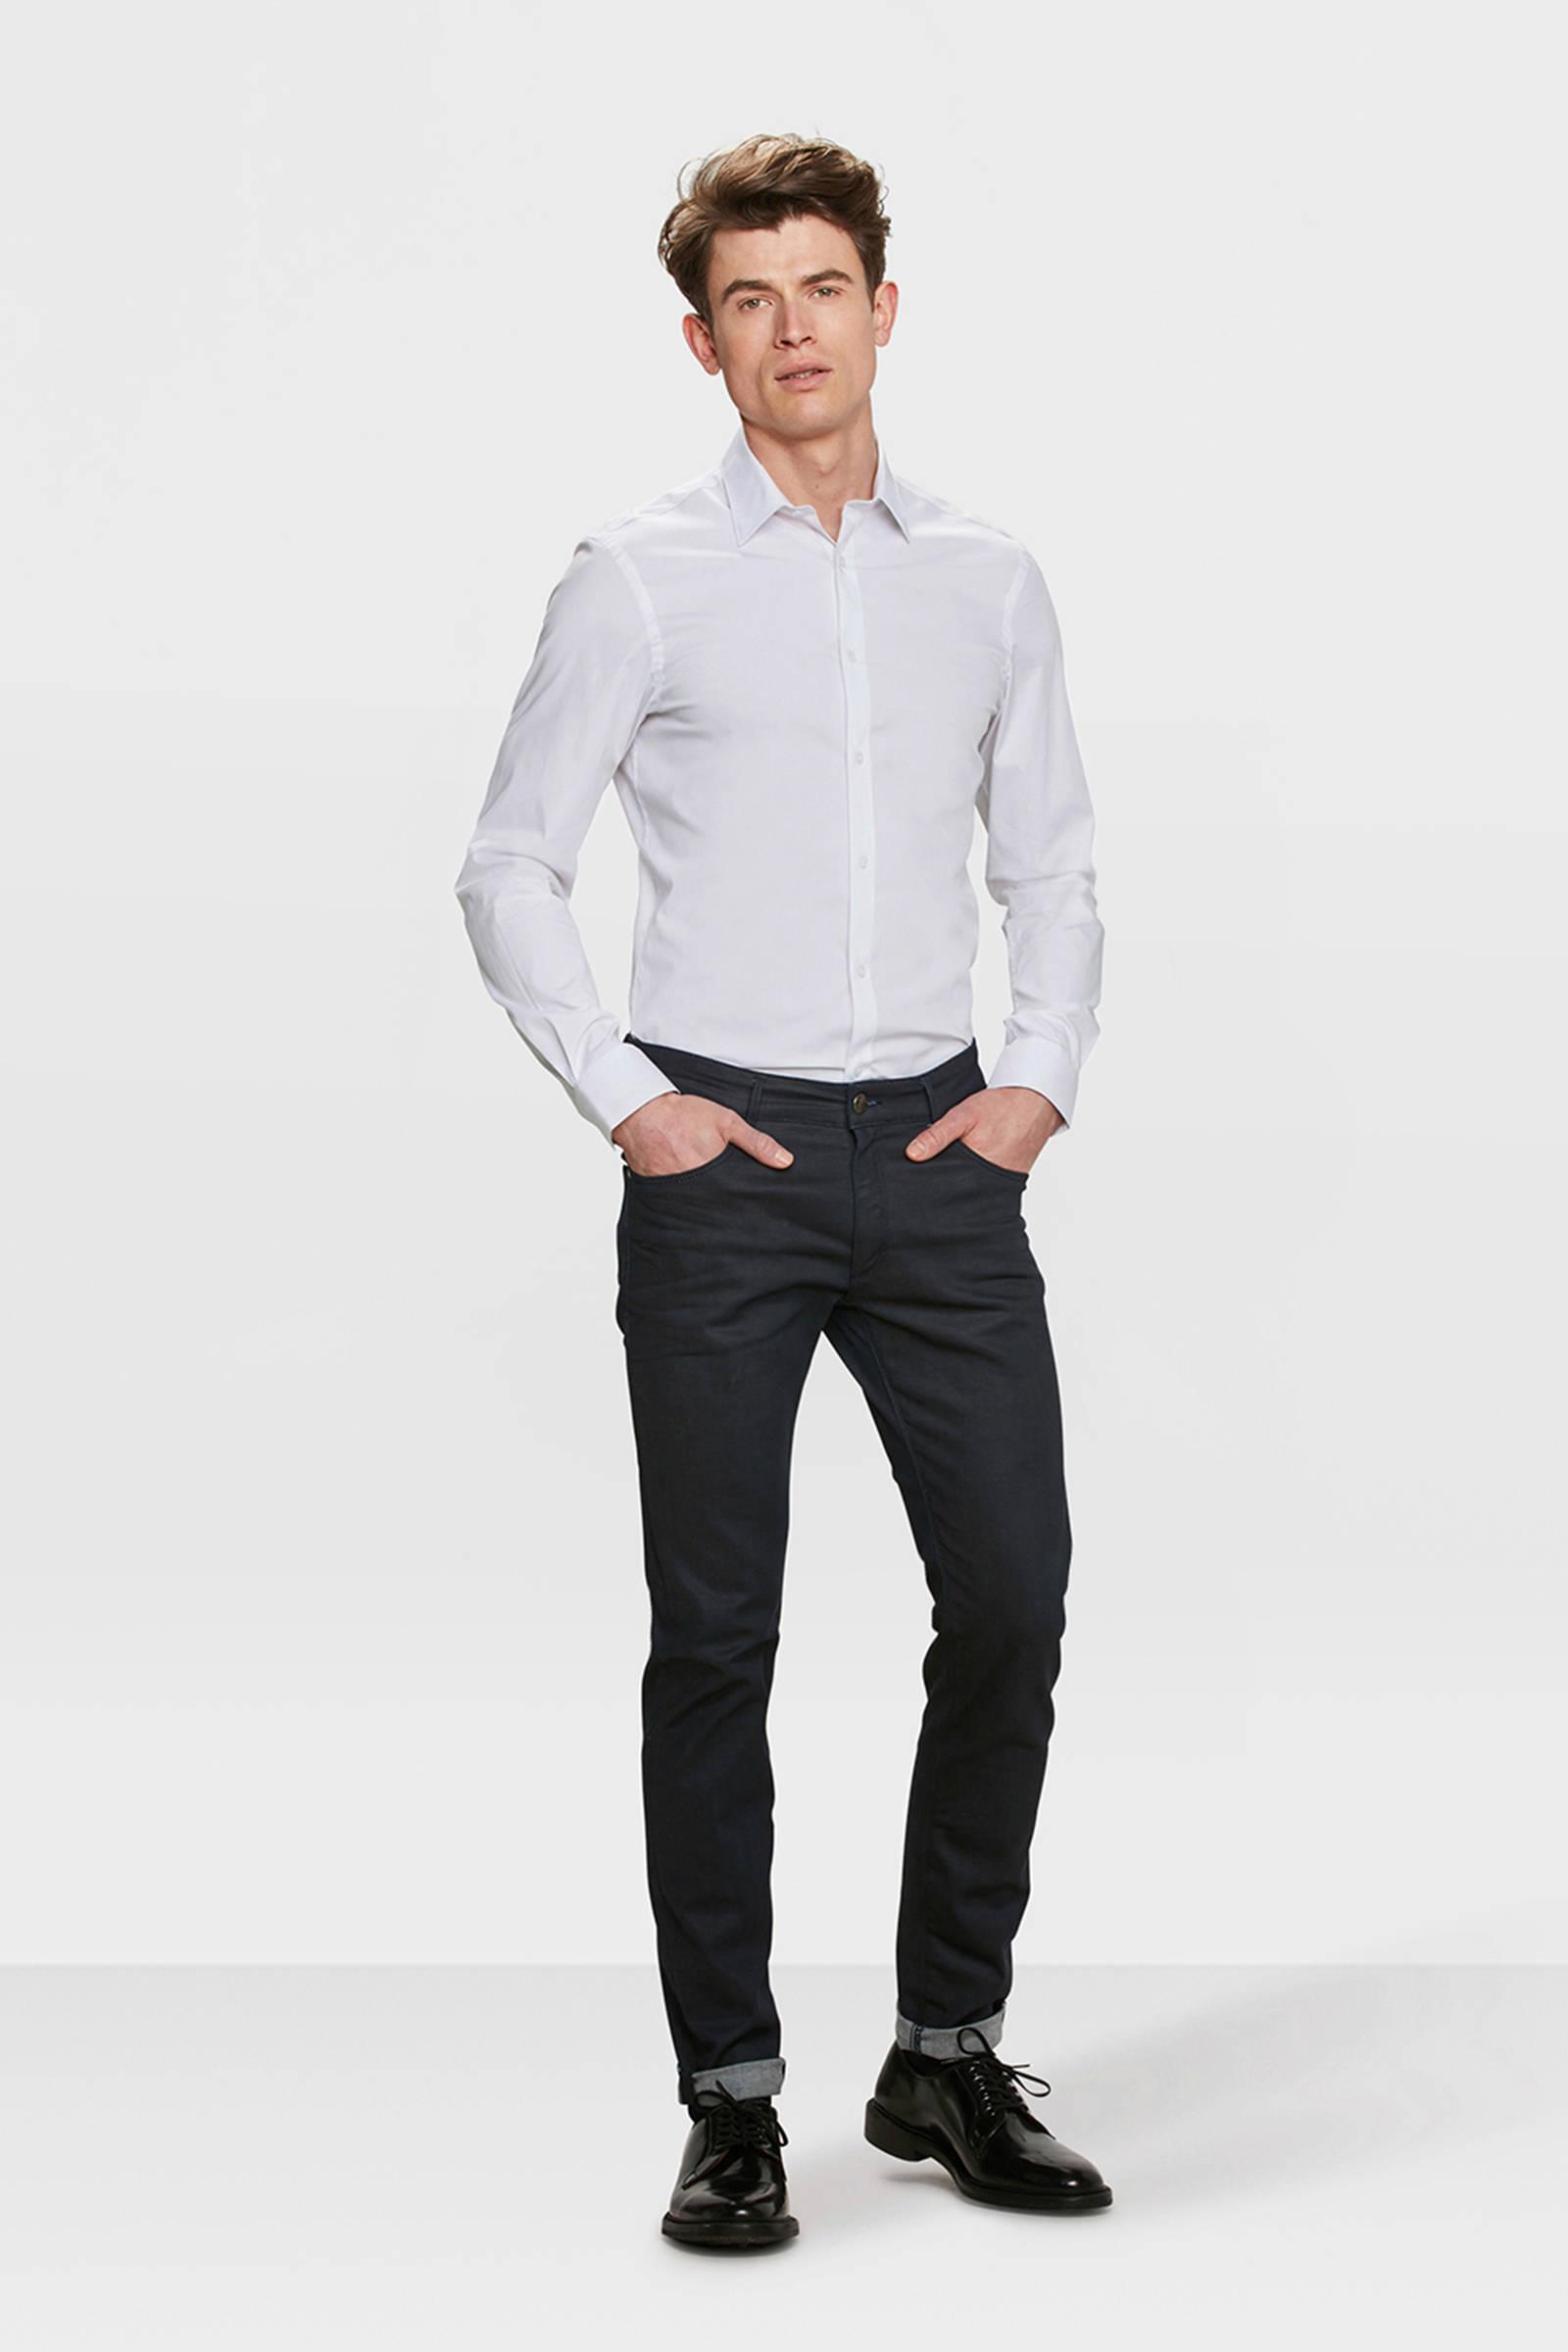 Feestelijk Overhemd.We Fashion Slim Fit Overhemd Wehkamp